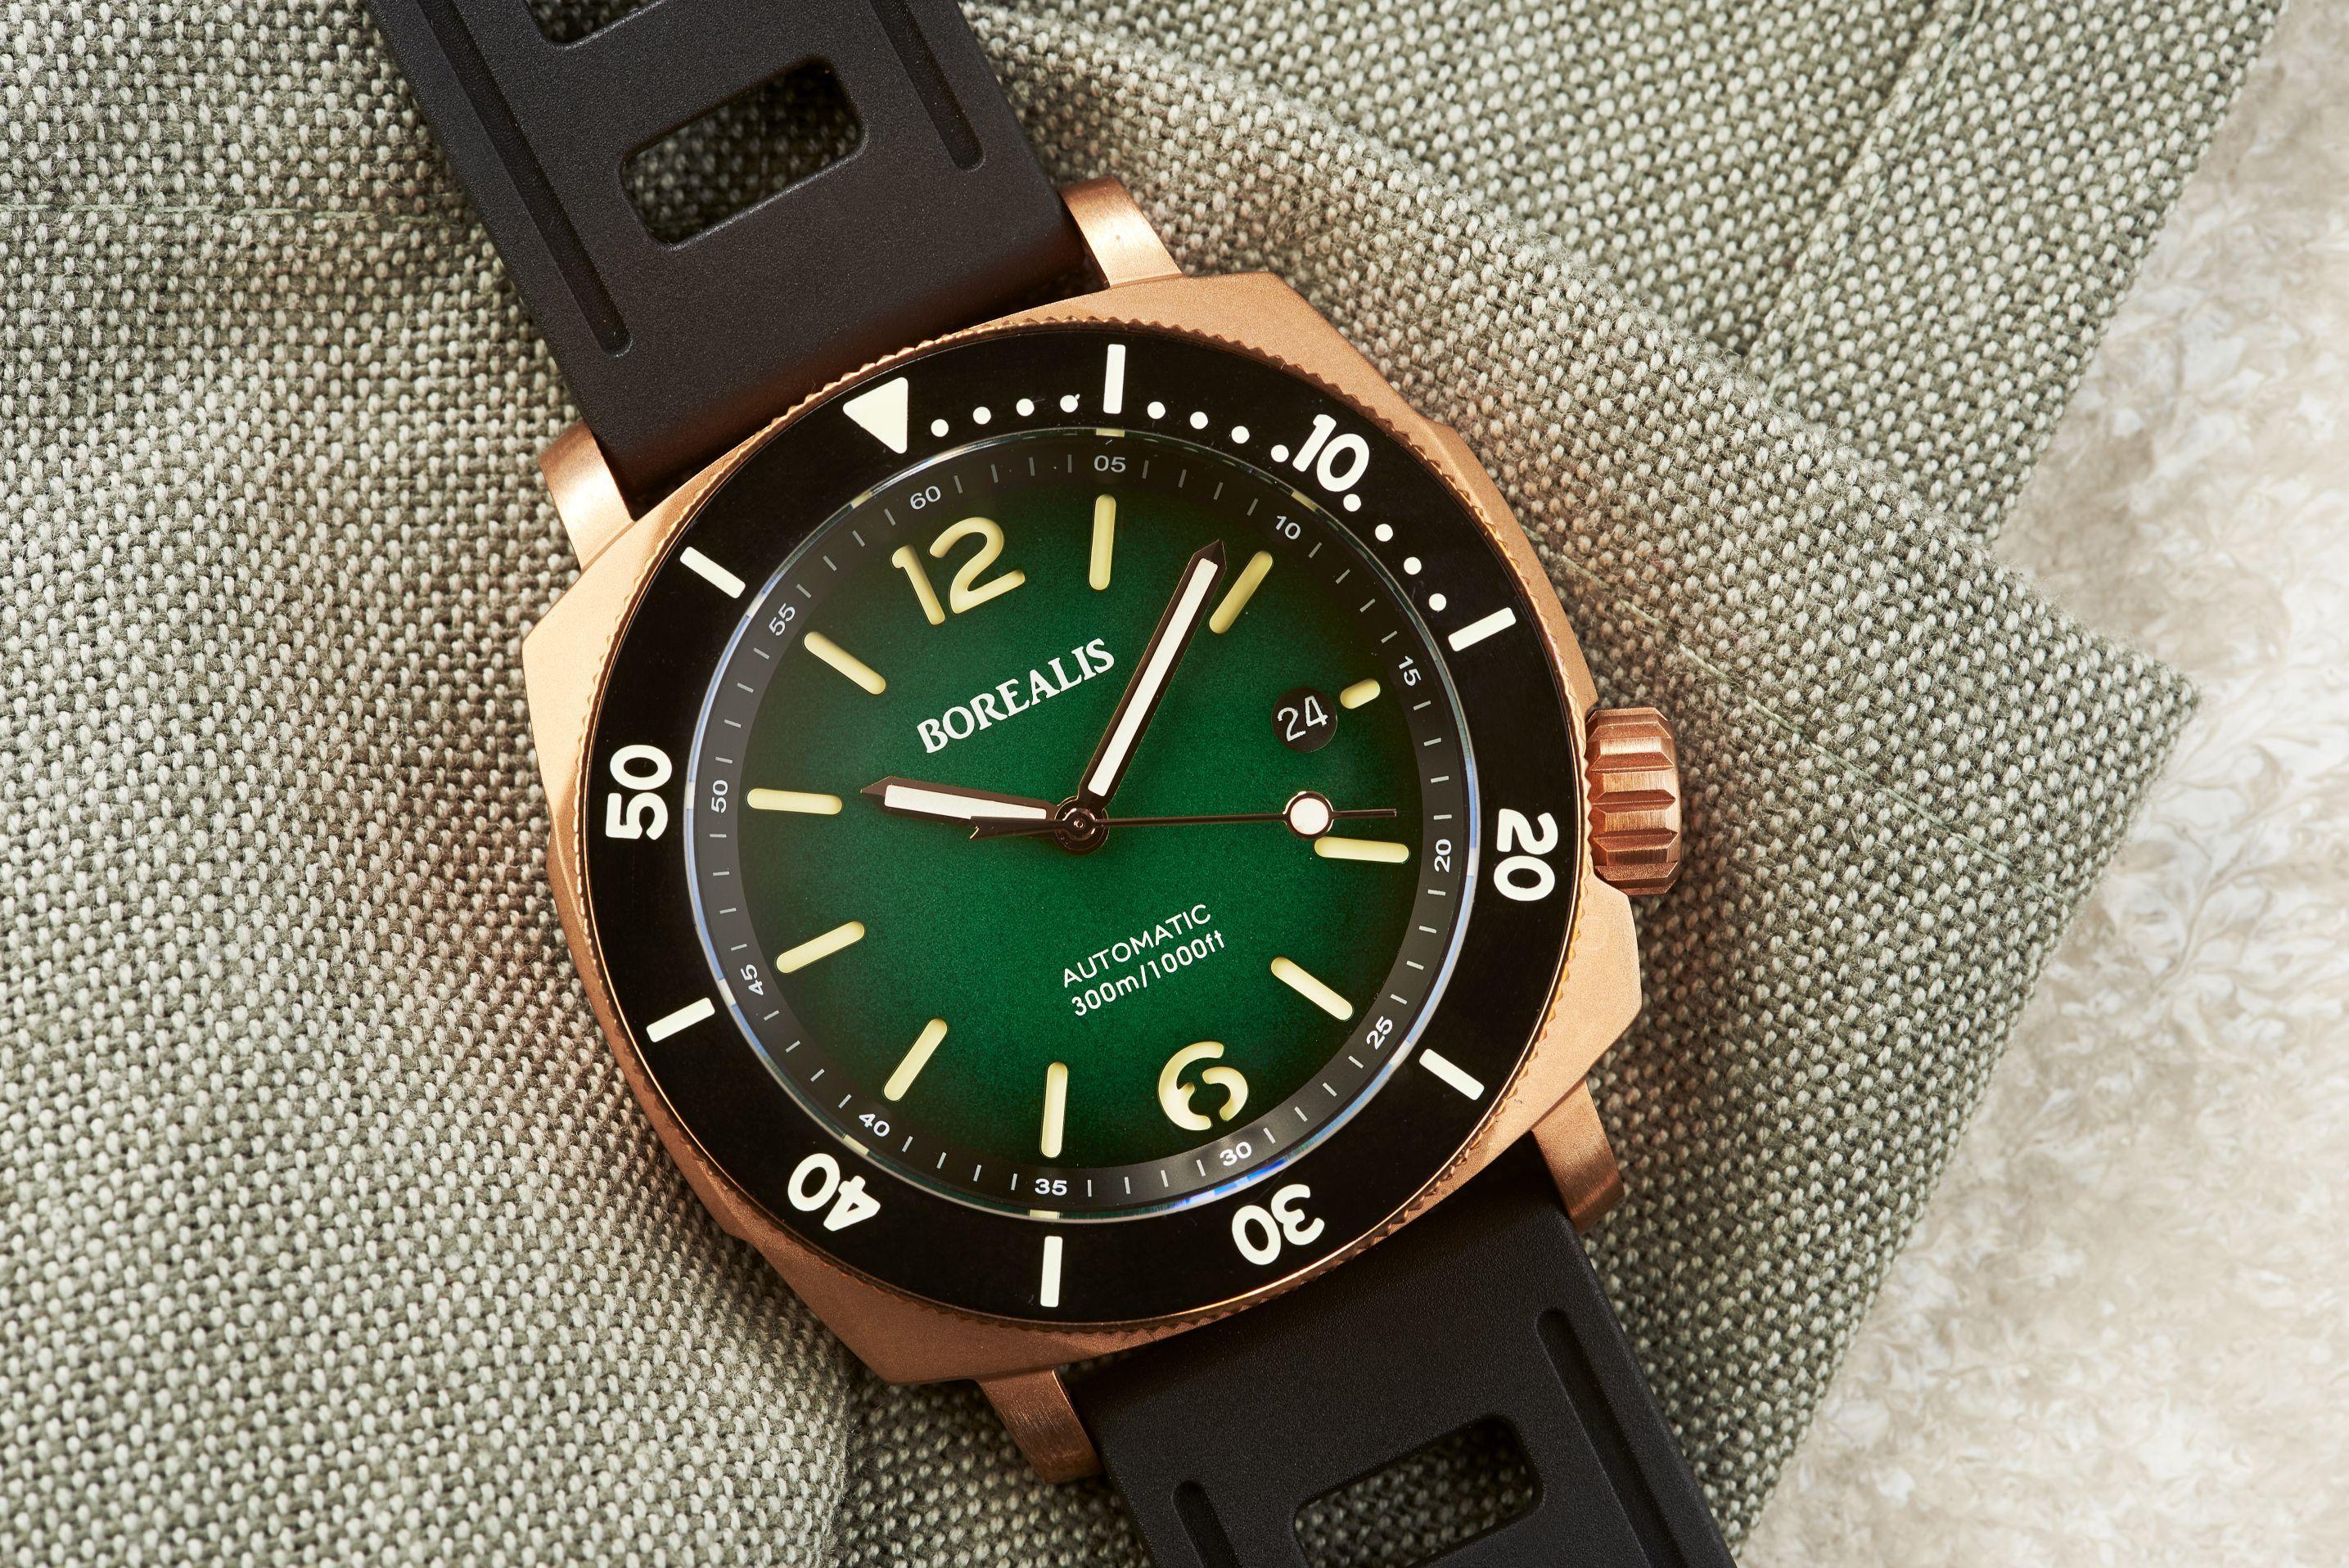 Borealis Navale CuSn8 Bronze 300m Diver Watch Miyota 9015 Green Fumed Dial Version ER Rotating Bezel BNAVALEERGREEN